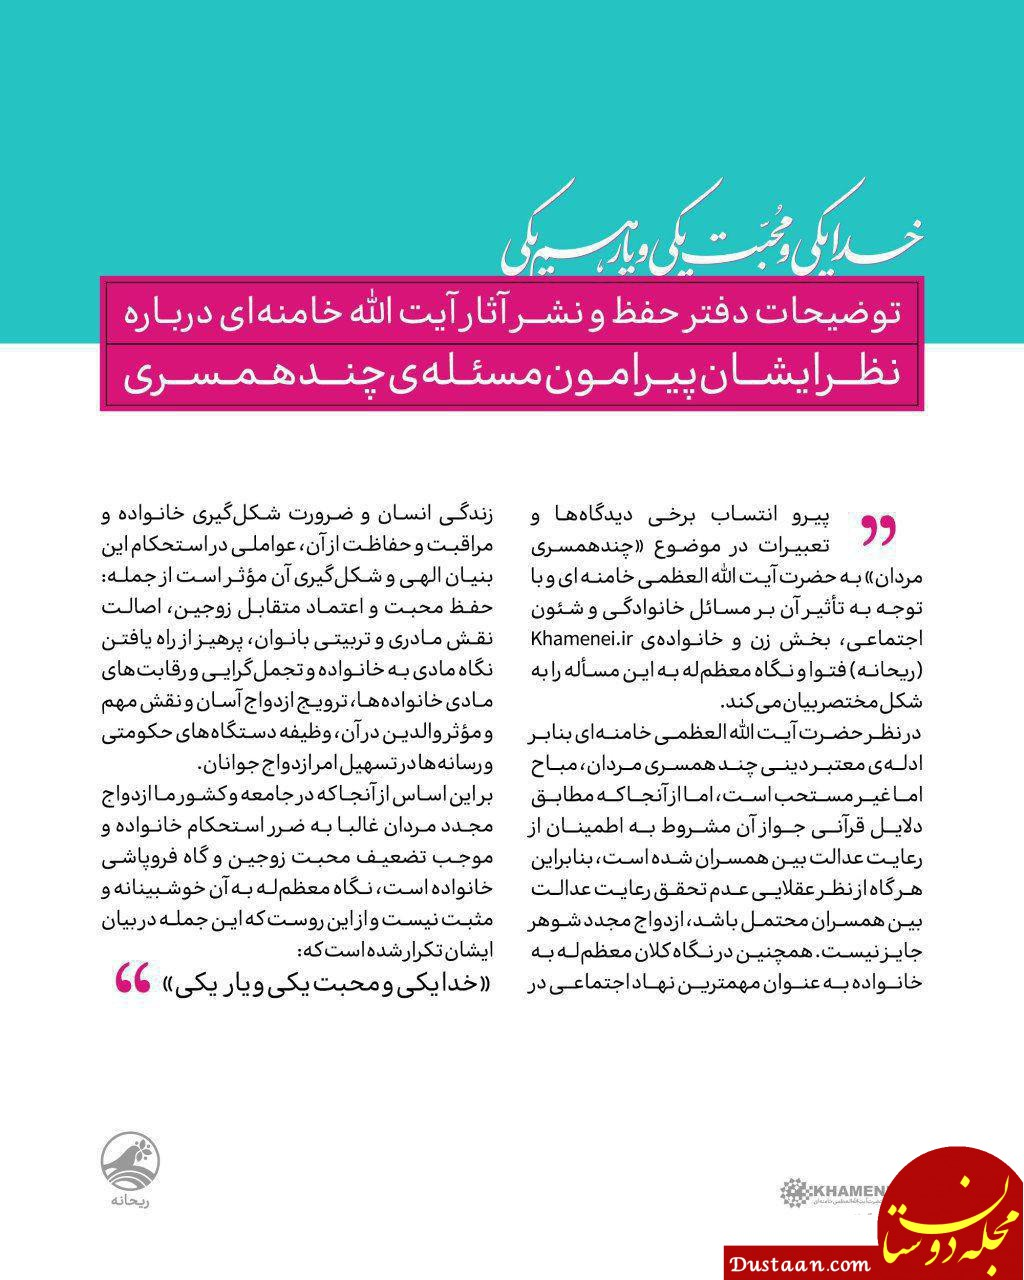 www.dustaan.com نظر رهبر انقلاب درباره مسئلهی چندهمسری